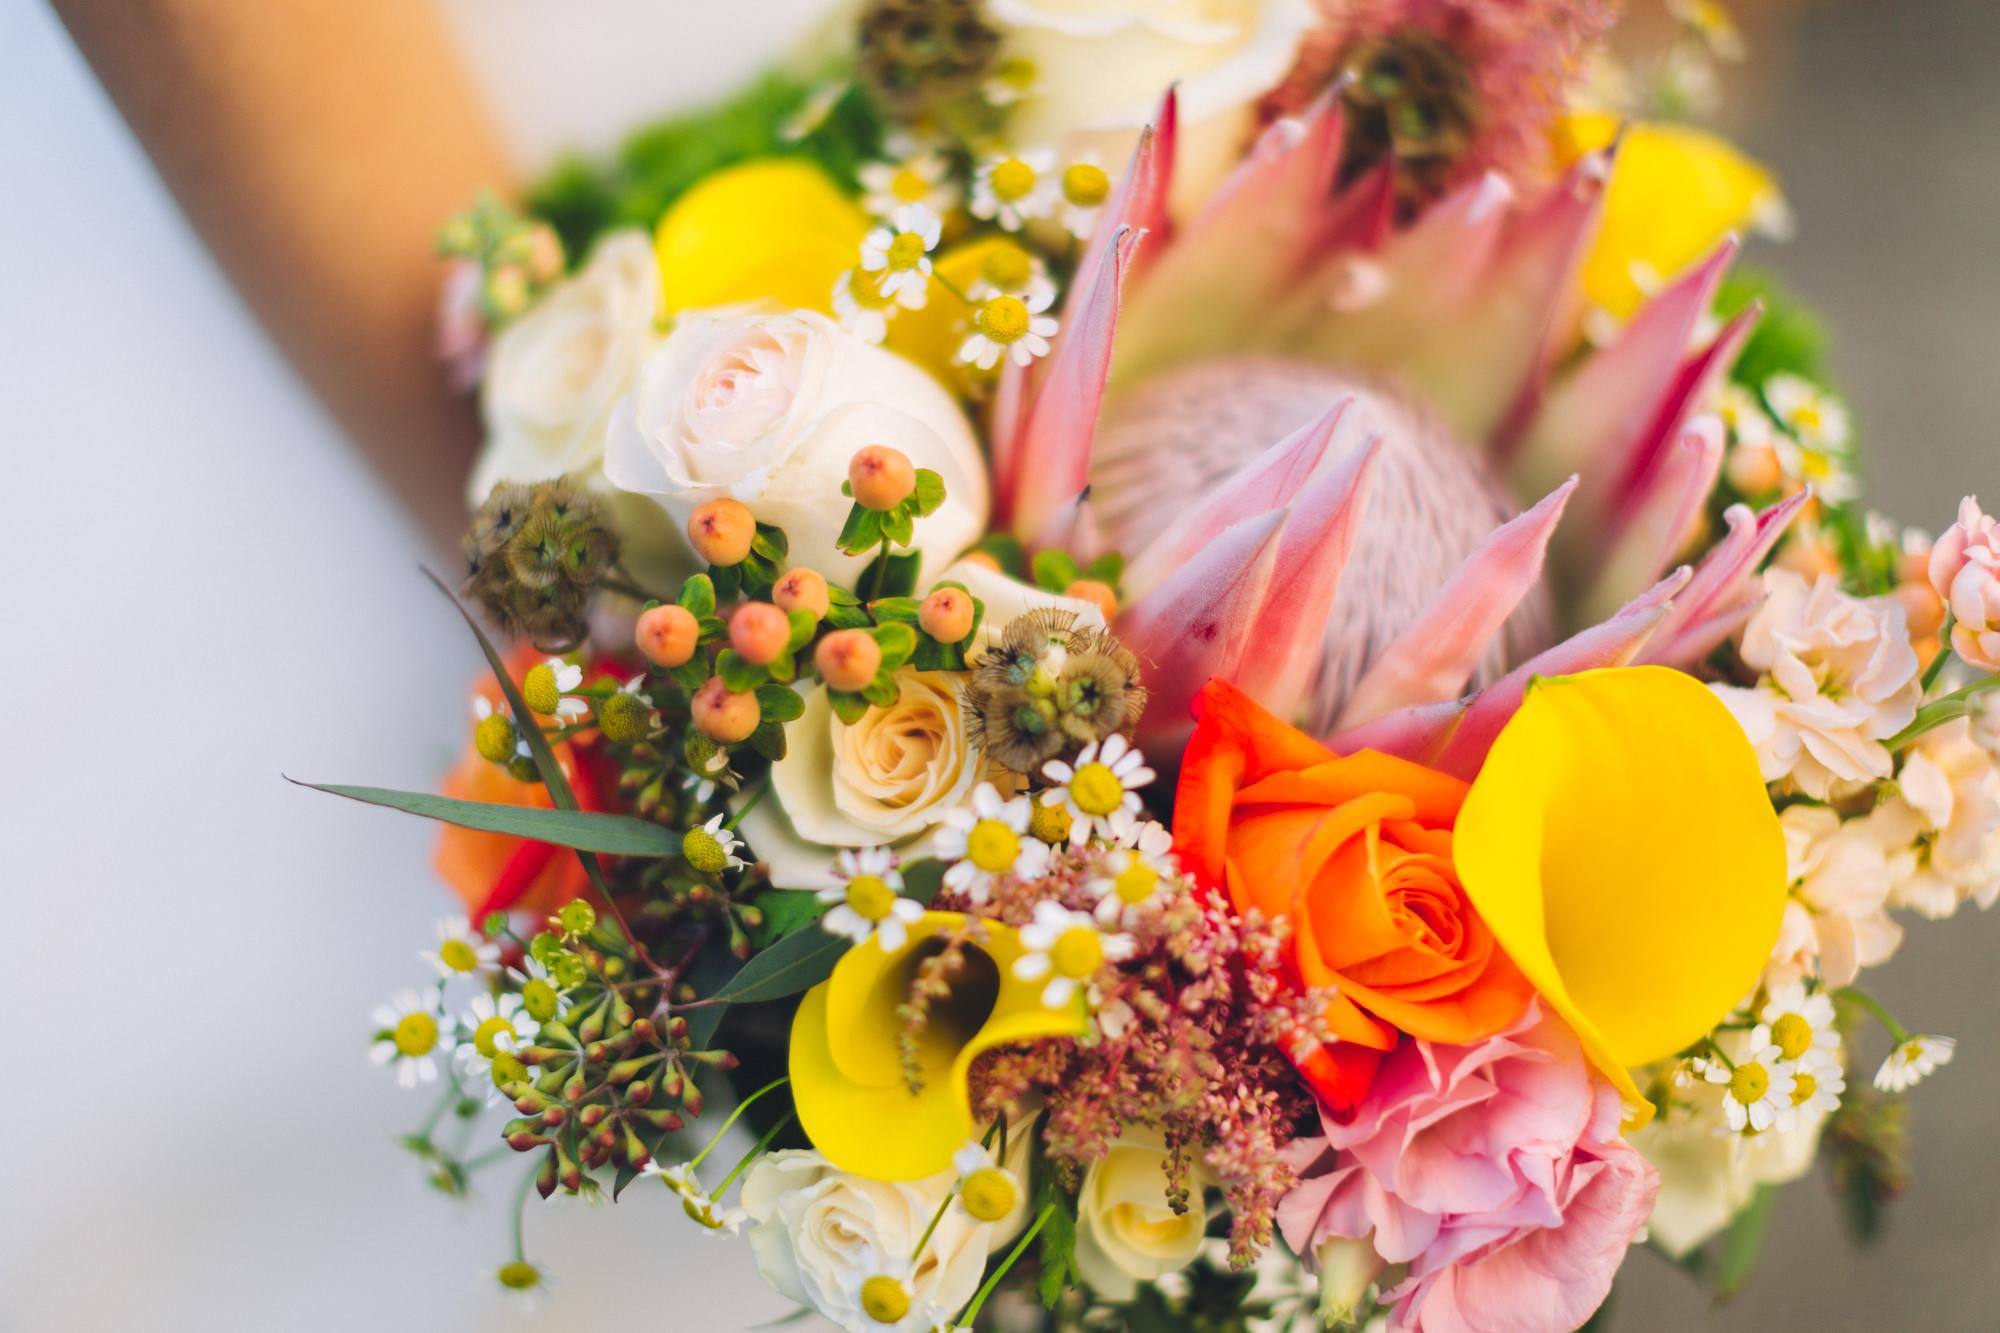 thelightandglass-wedding-engagement-photography-079.jpg